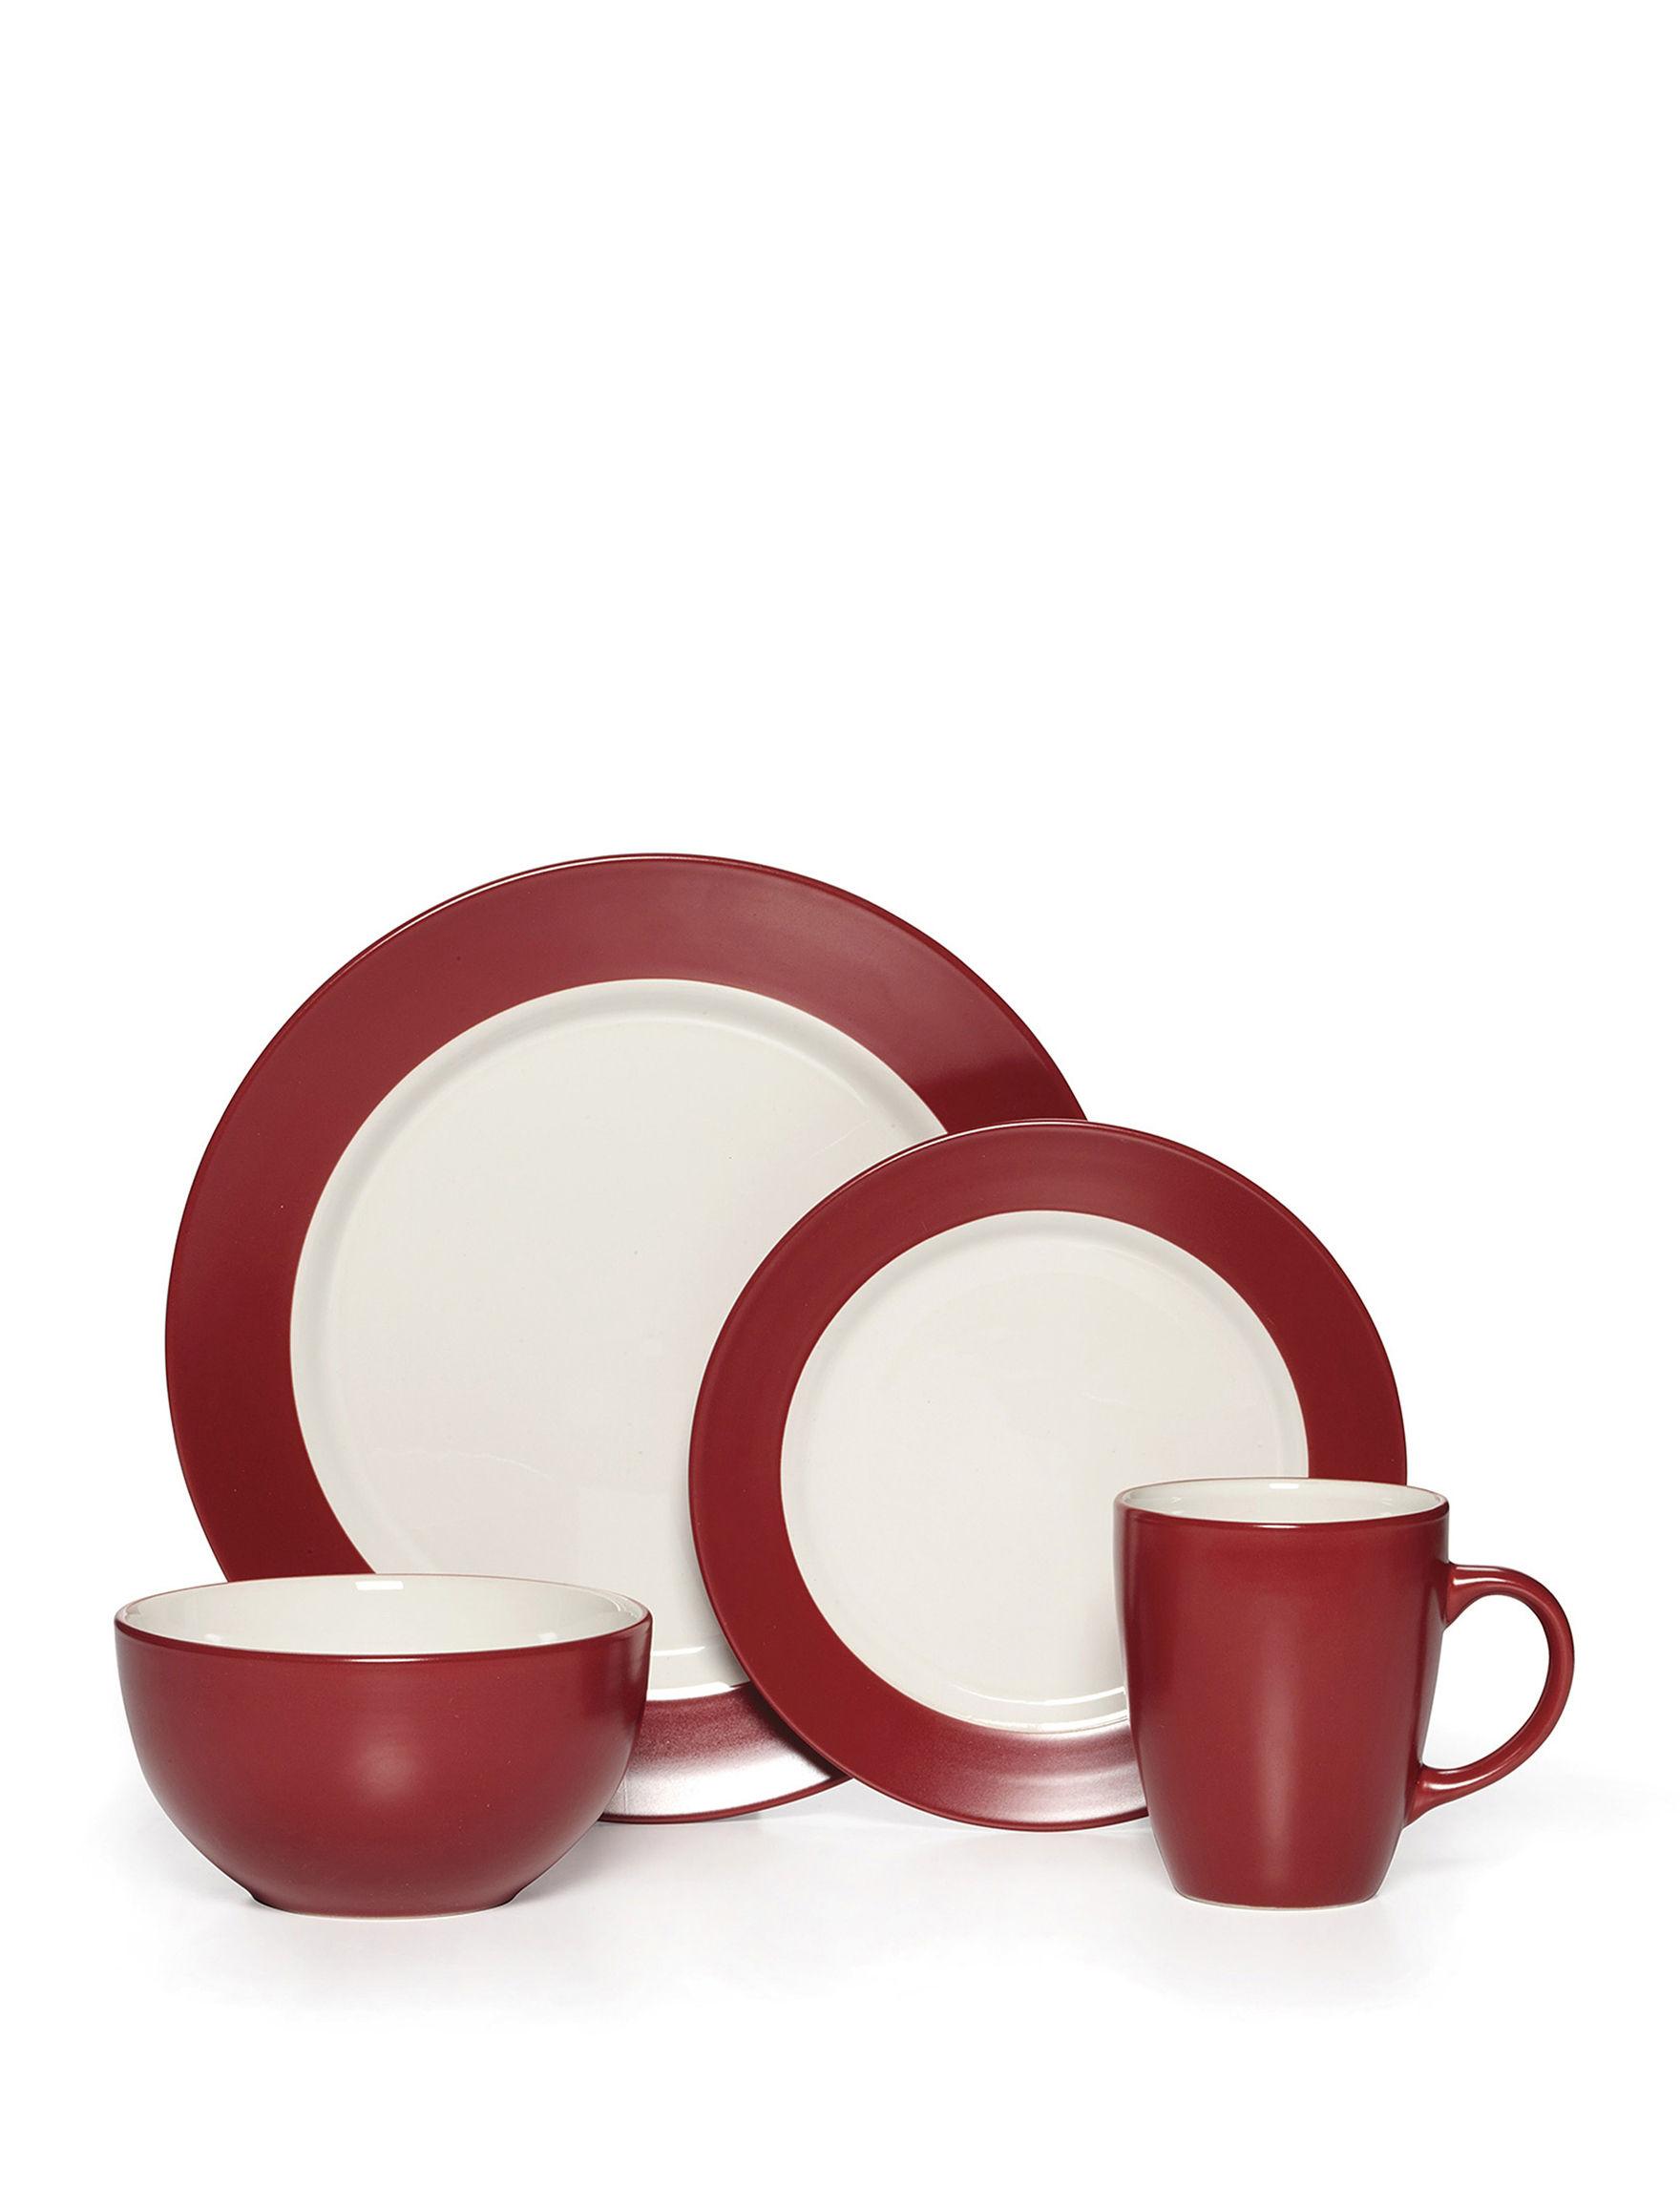 Pfaltzgraff Red Dinnerware Sets Dinnerware